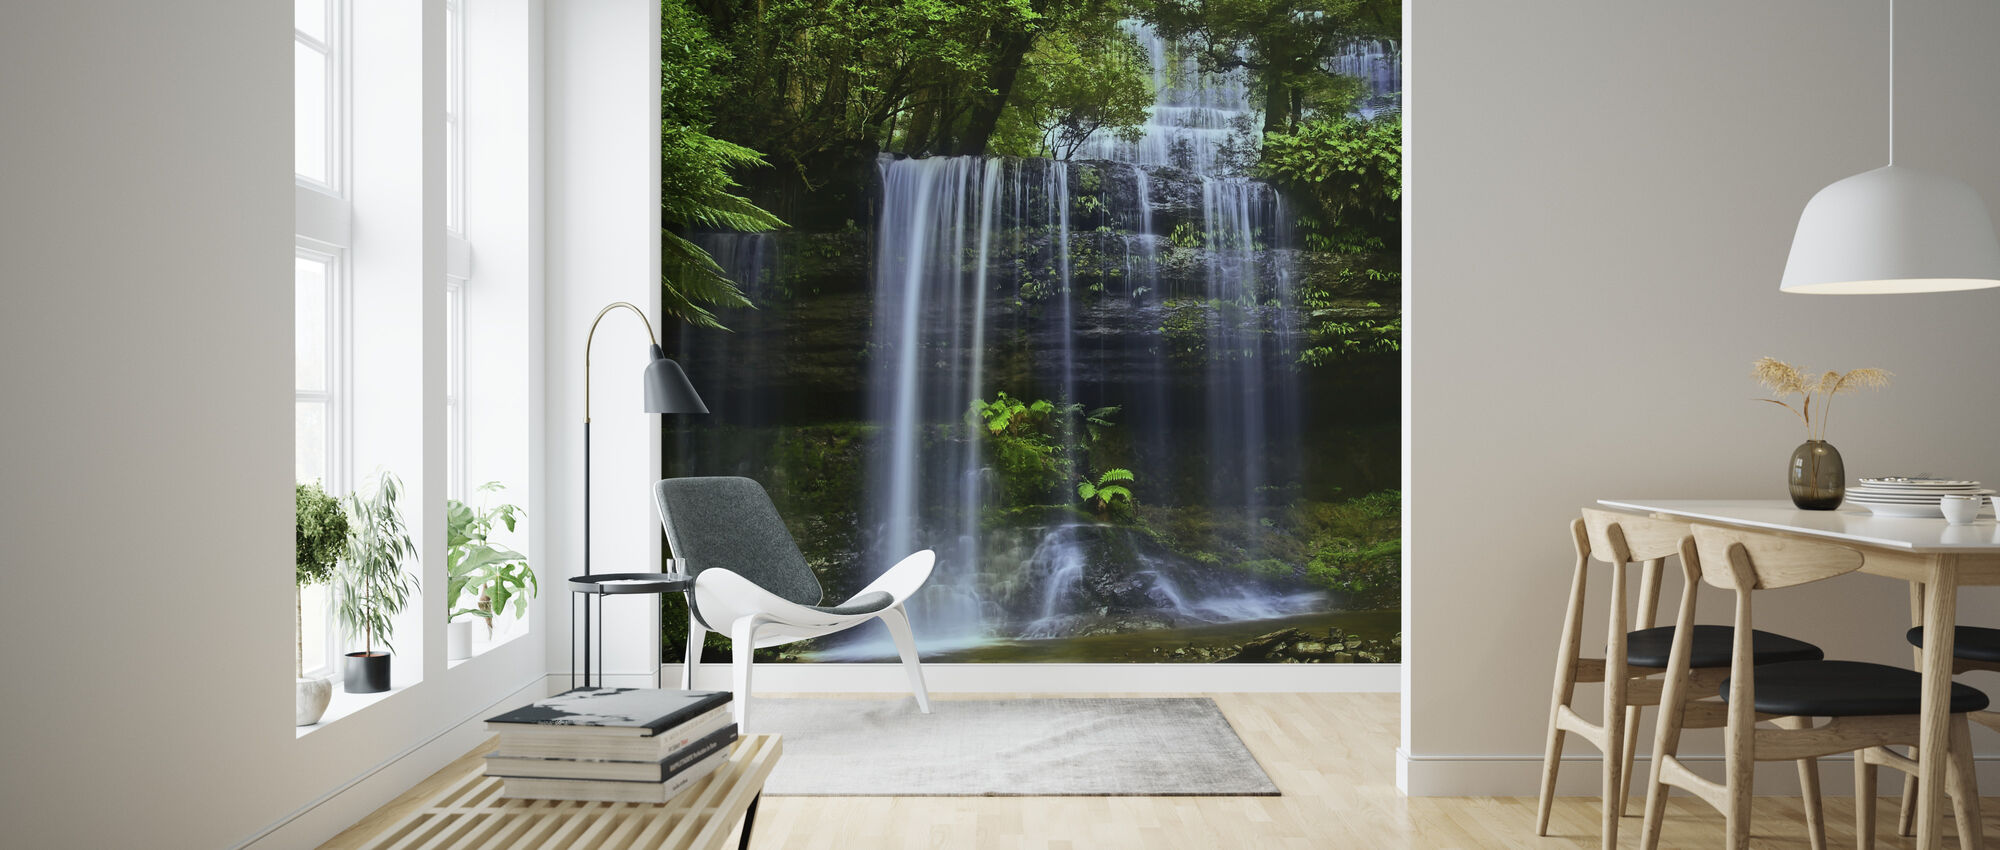 Tasmania Waterfall - Wallpaper - Living Room